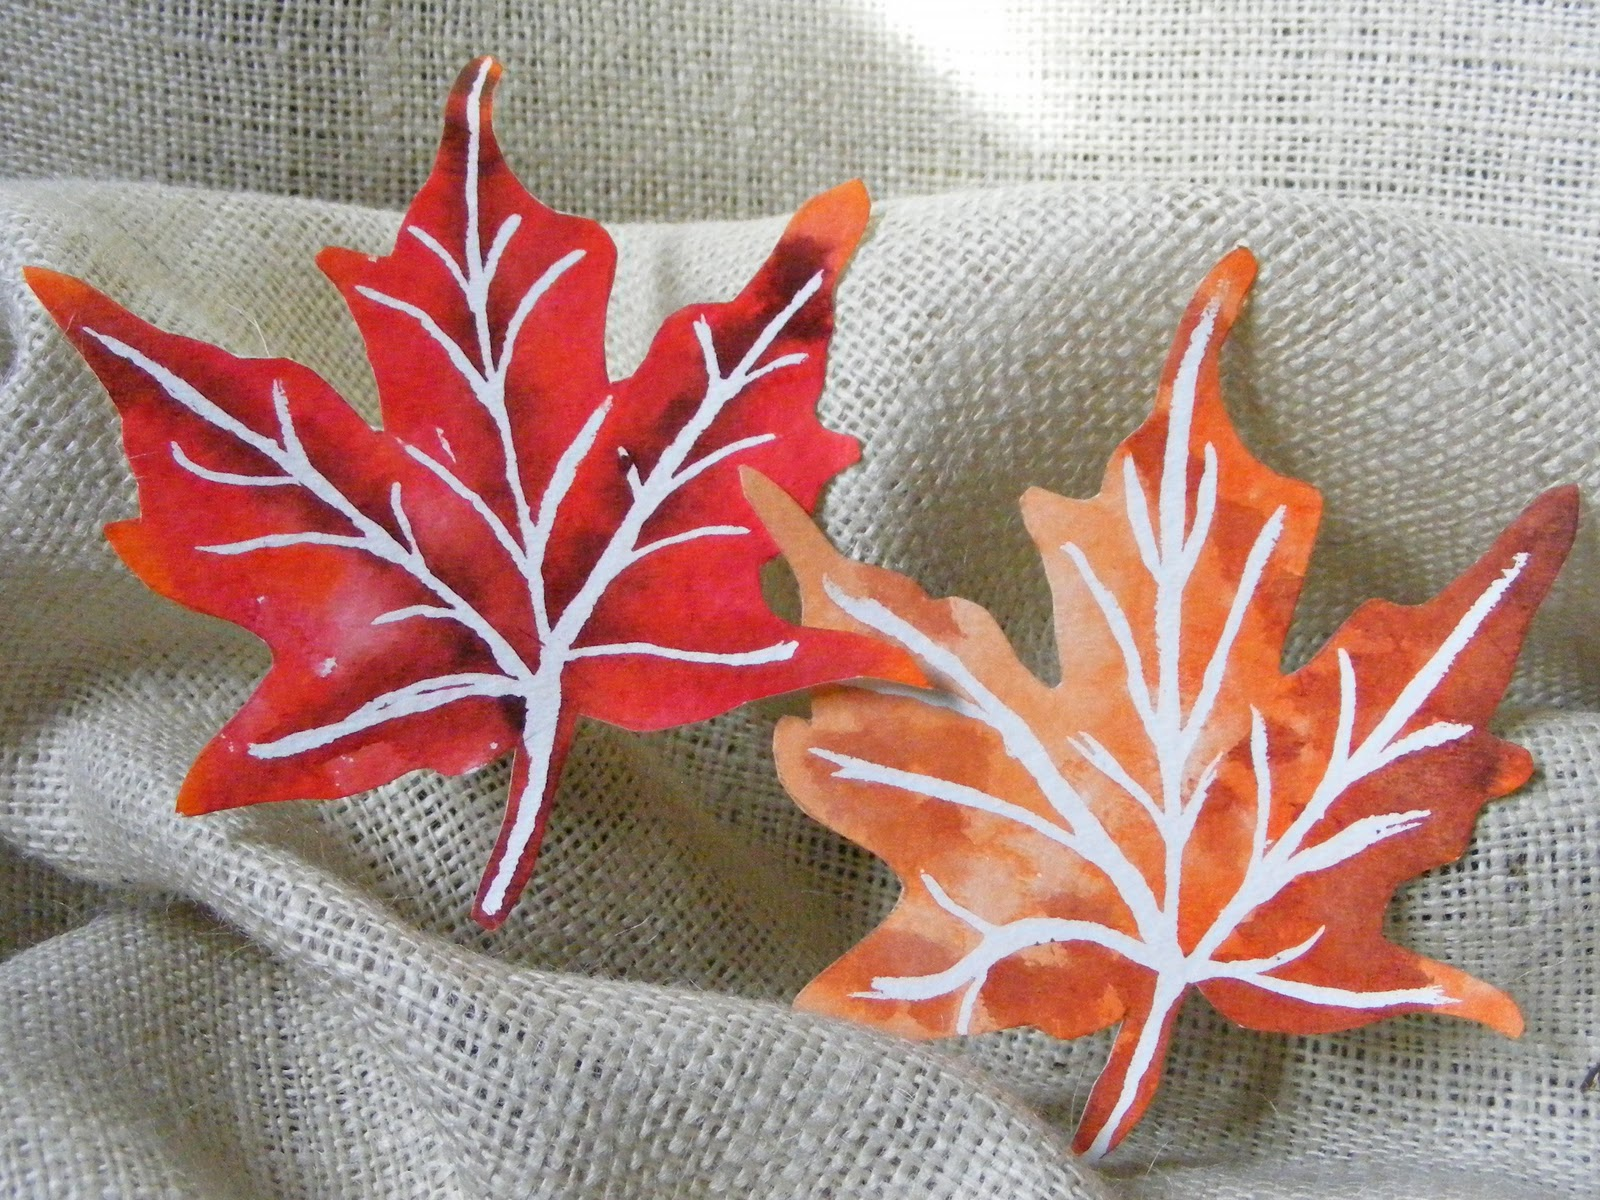 Fall Craft Sunday School